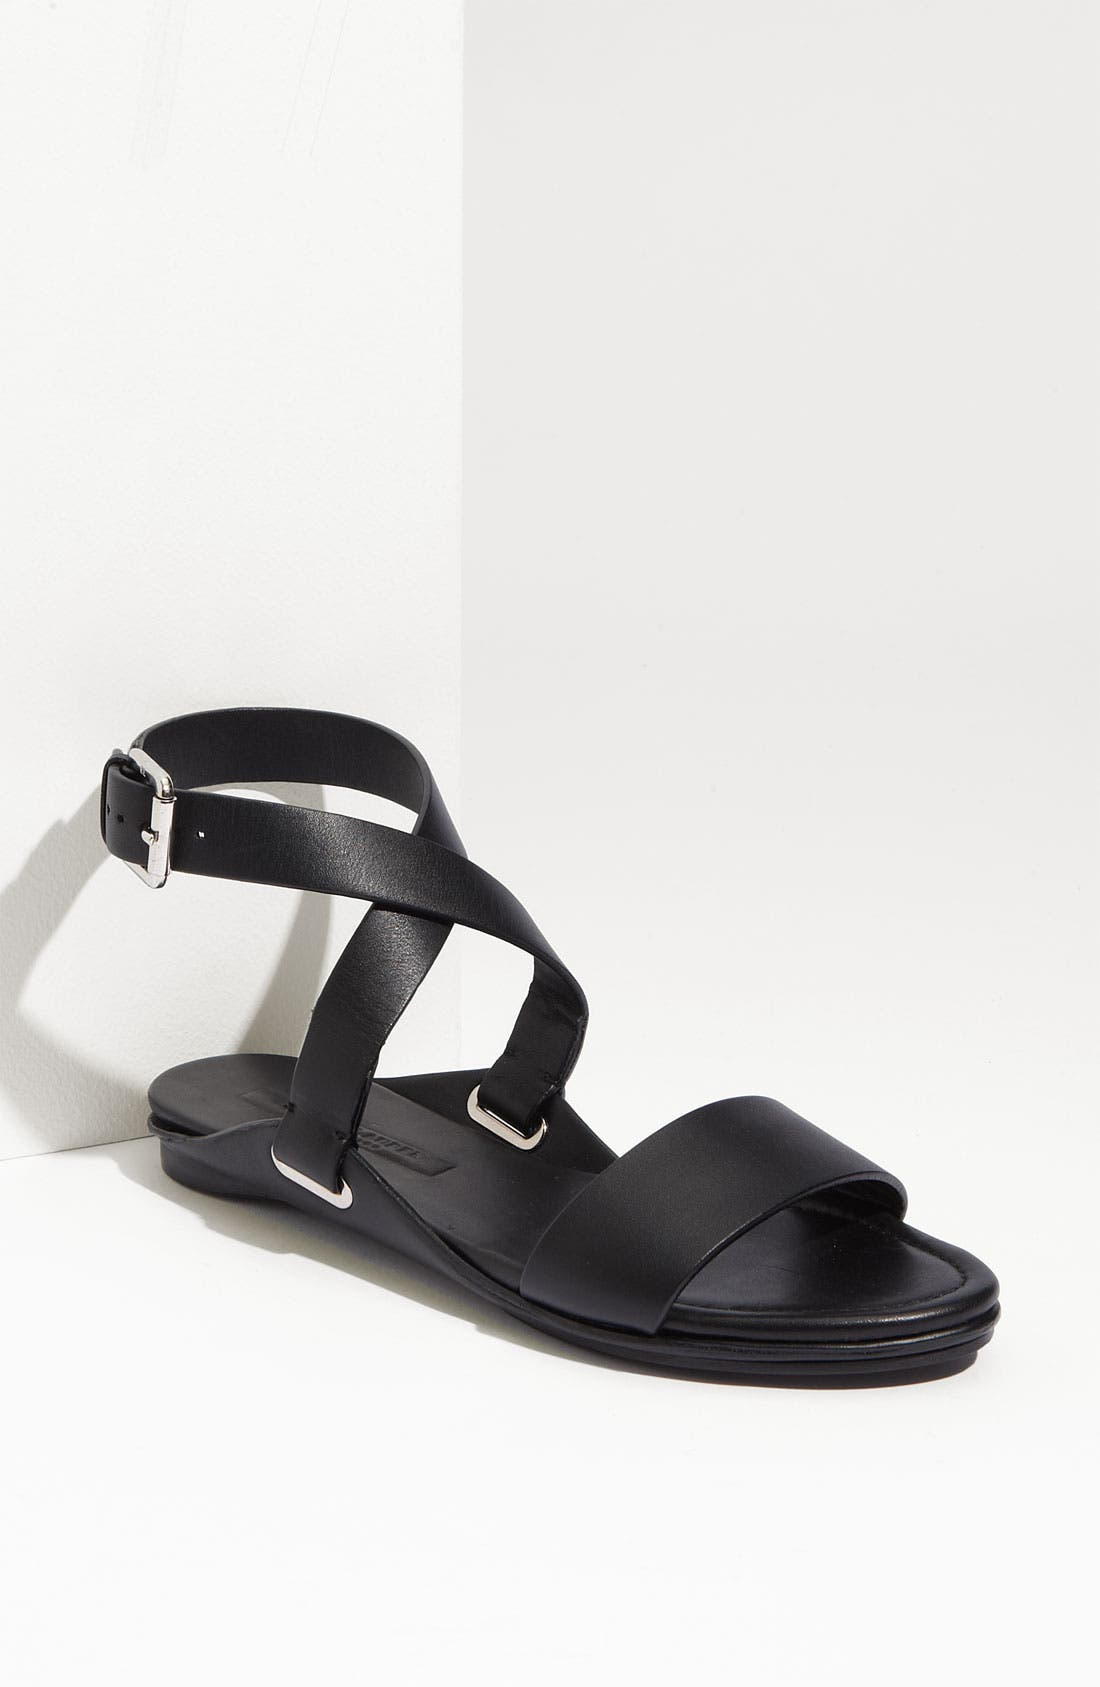 Alternate Image 1 Selected - Ralph Lauren Collection 'Madalyn' Sandal